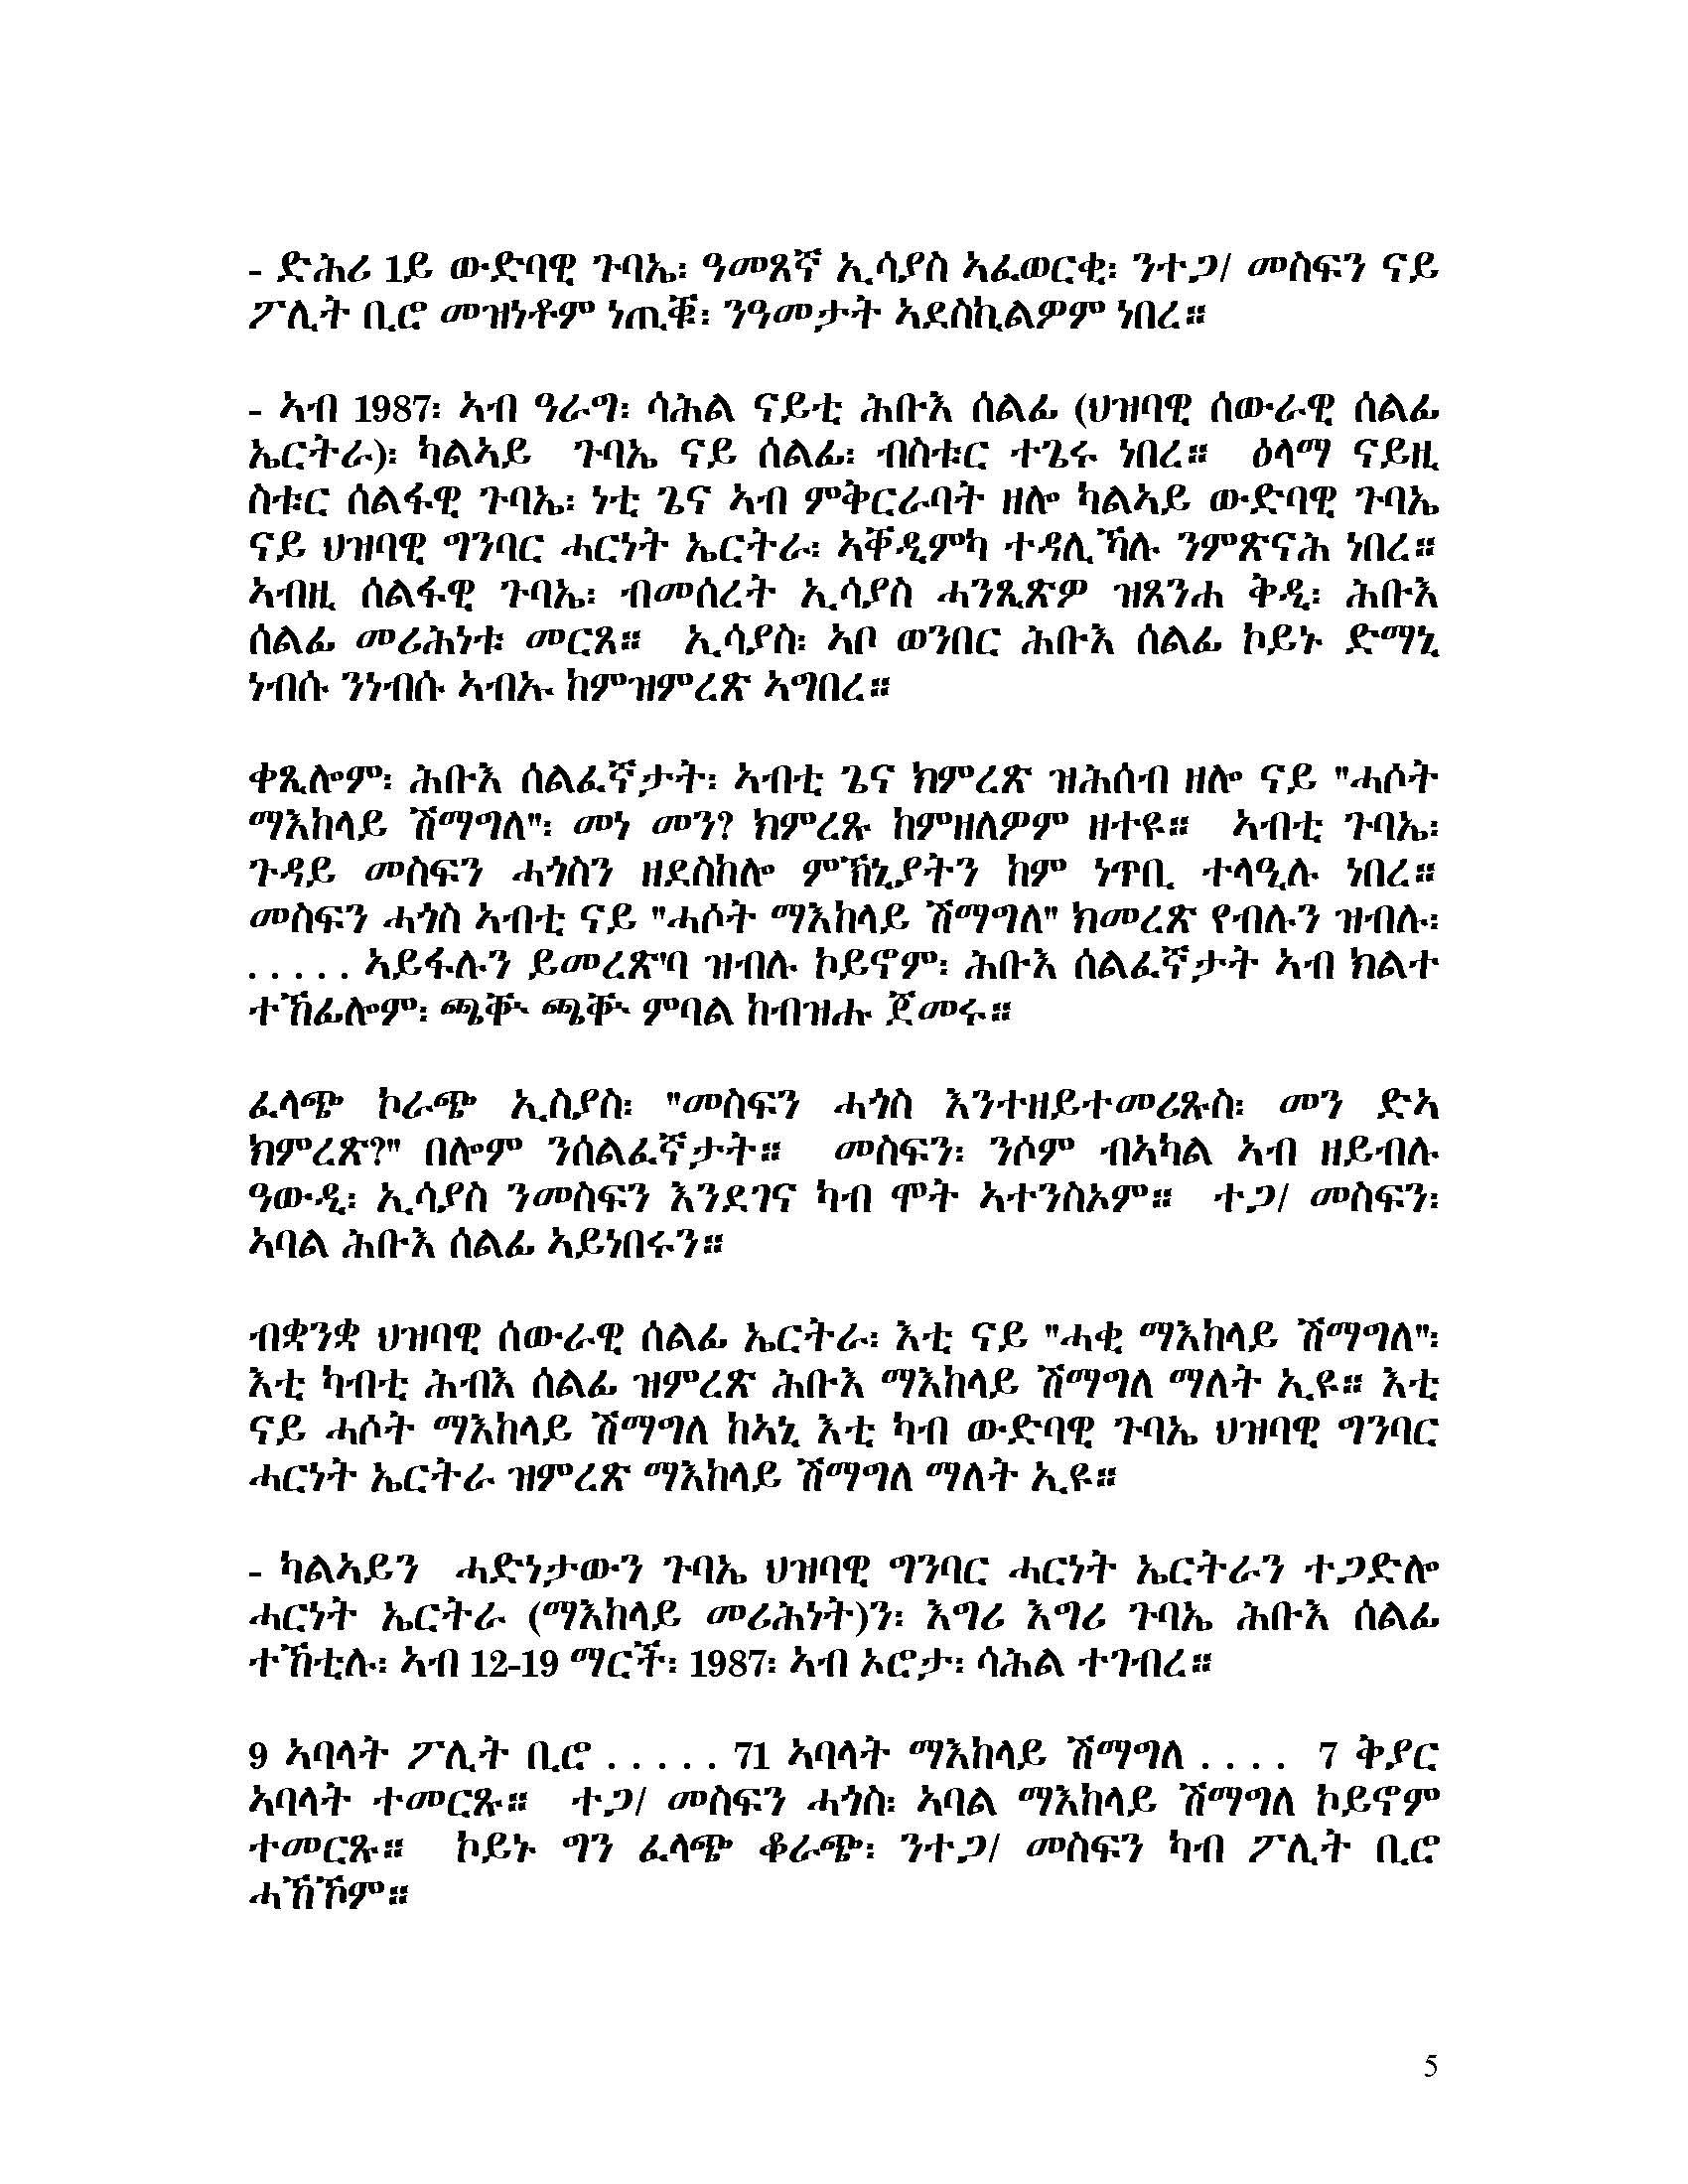 mesfun-fired-by-epdp-26nov20161_page_5